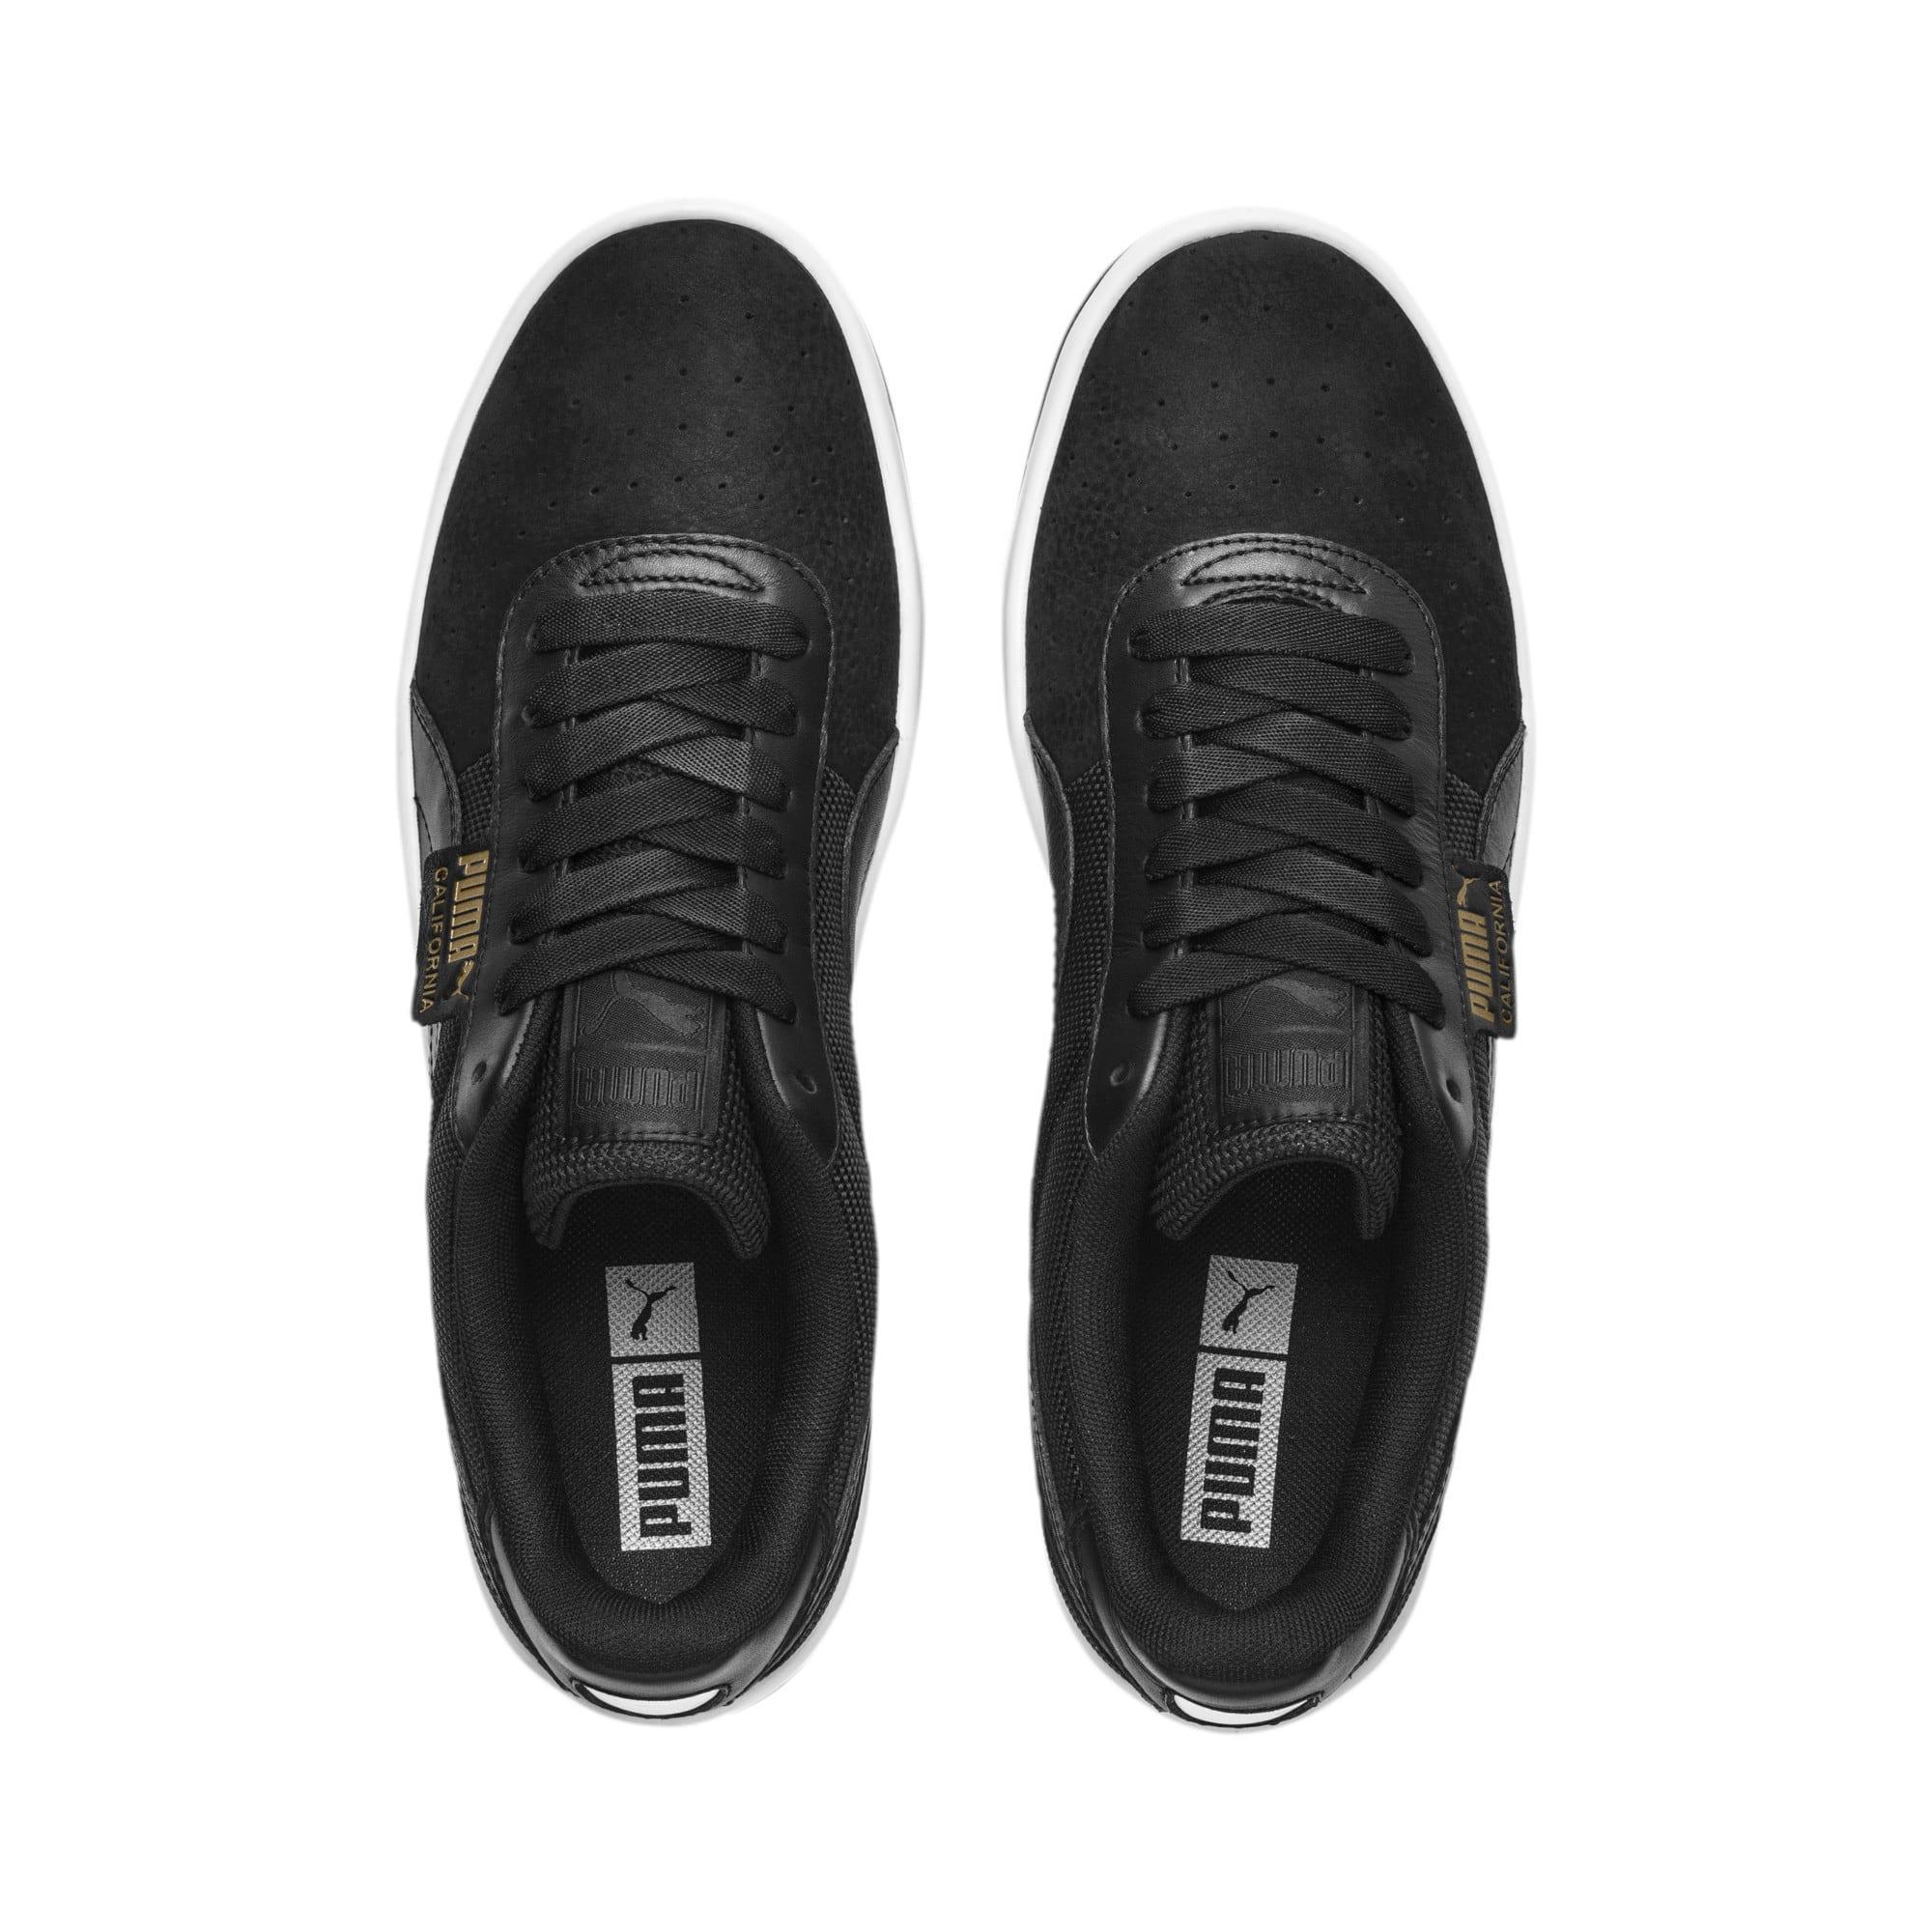 Miniatura 7 de Zapatos deportivos California, P Black-P White-P Black, mediano